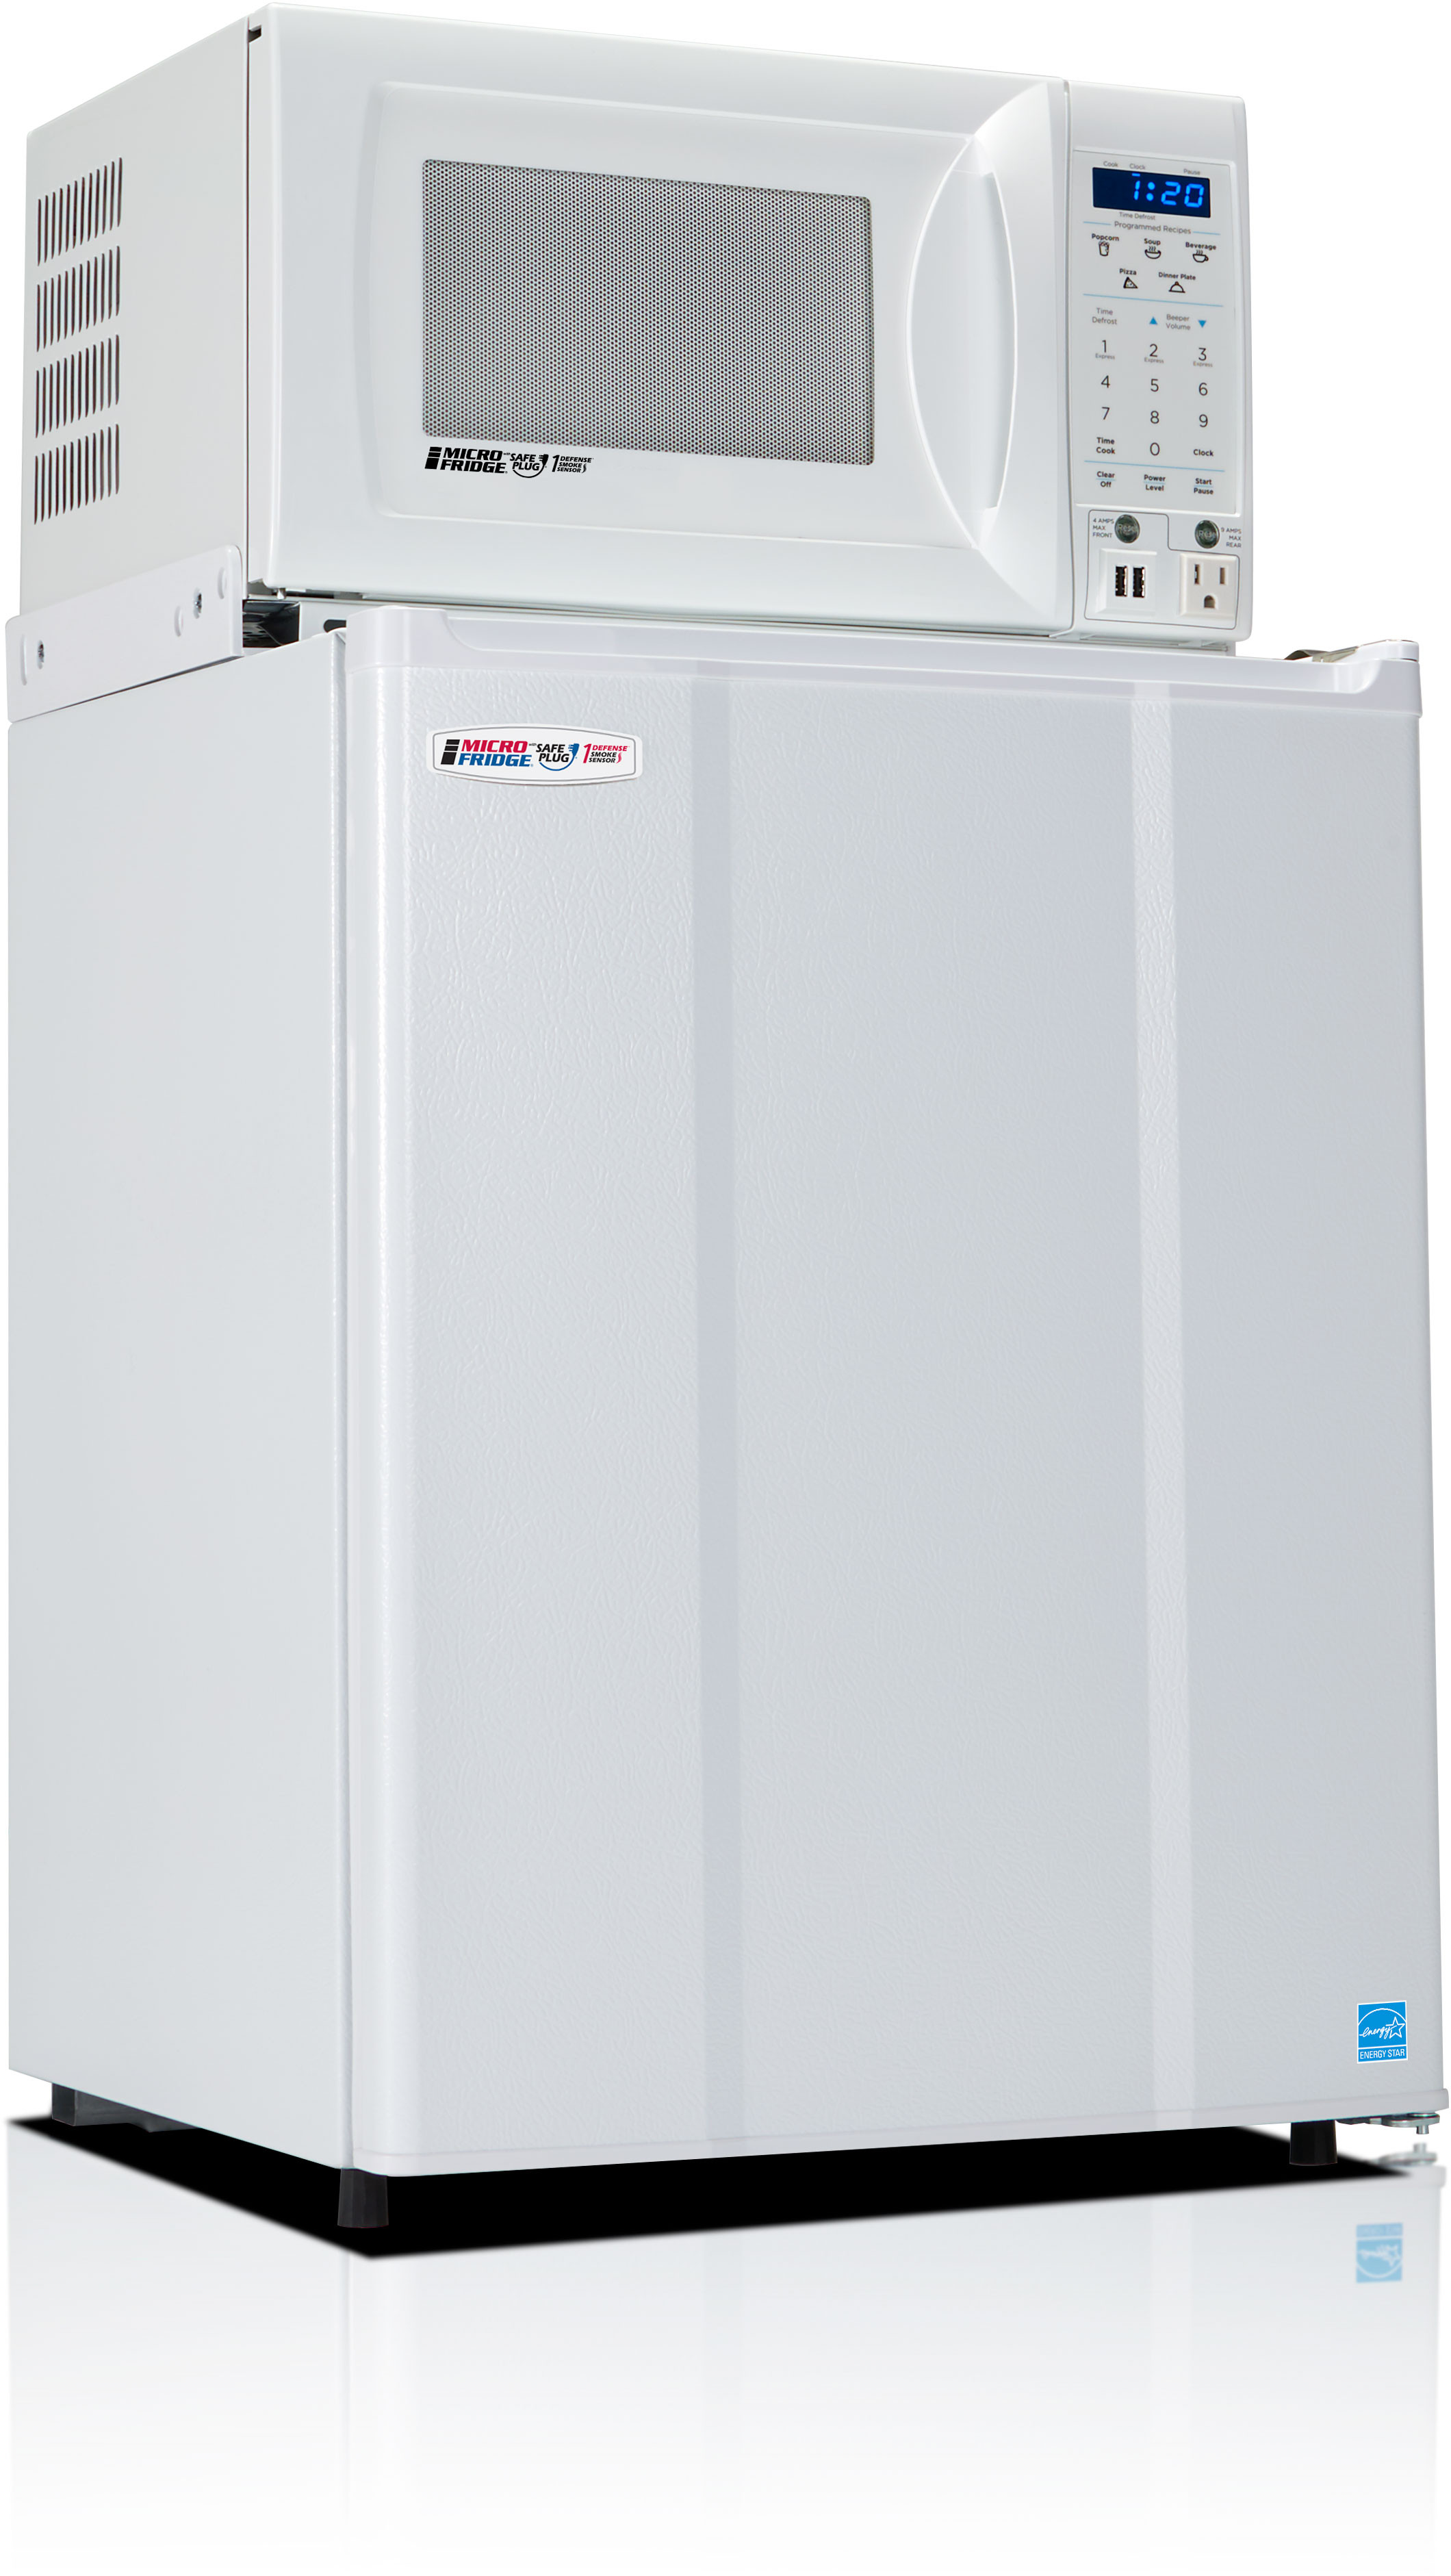 MicroFridge 19 Inch 2.28 Cu. Ft. Counter Depth Compact All-Refrigerator White 23MF47D1W